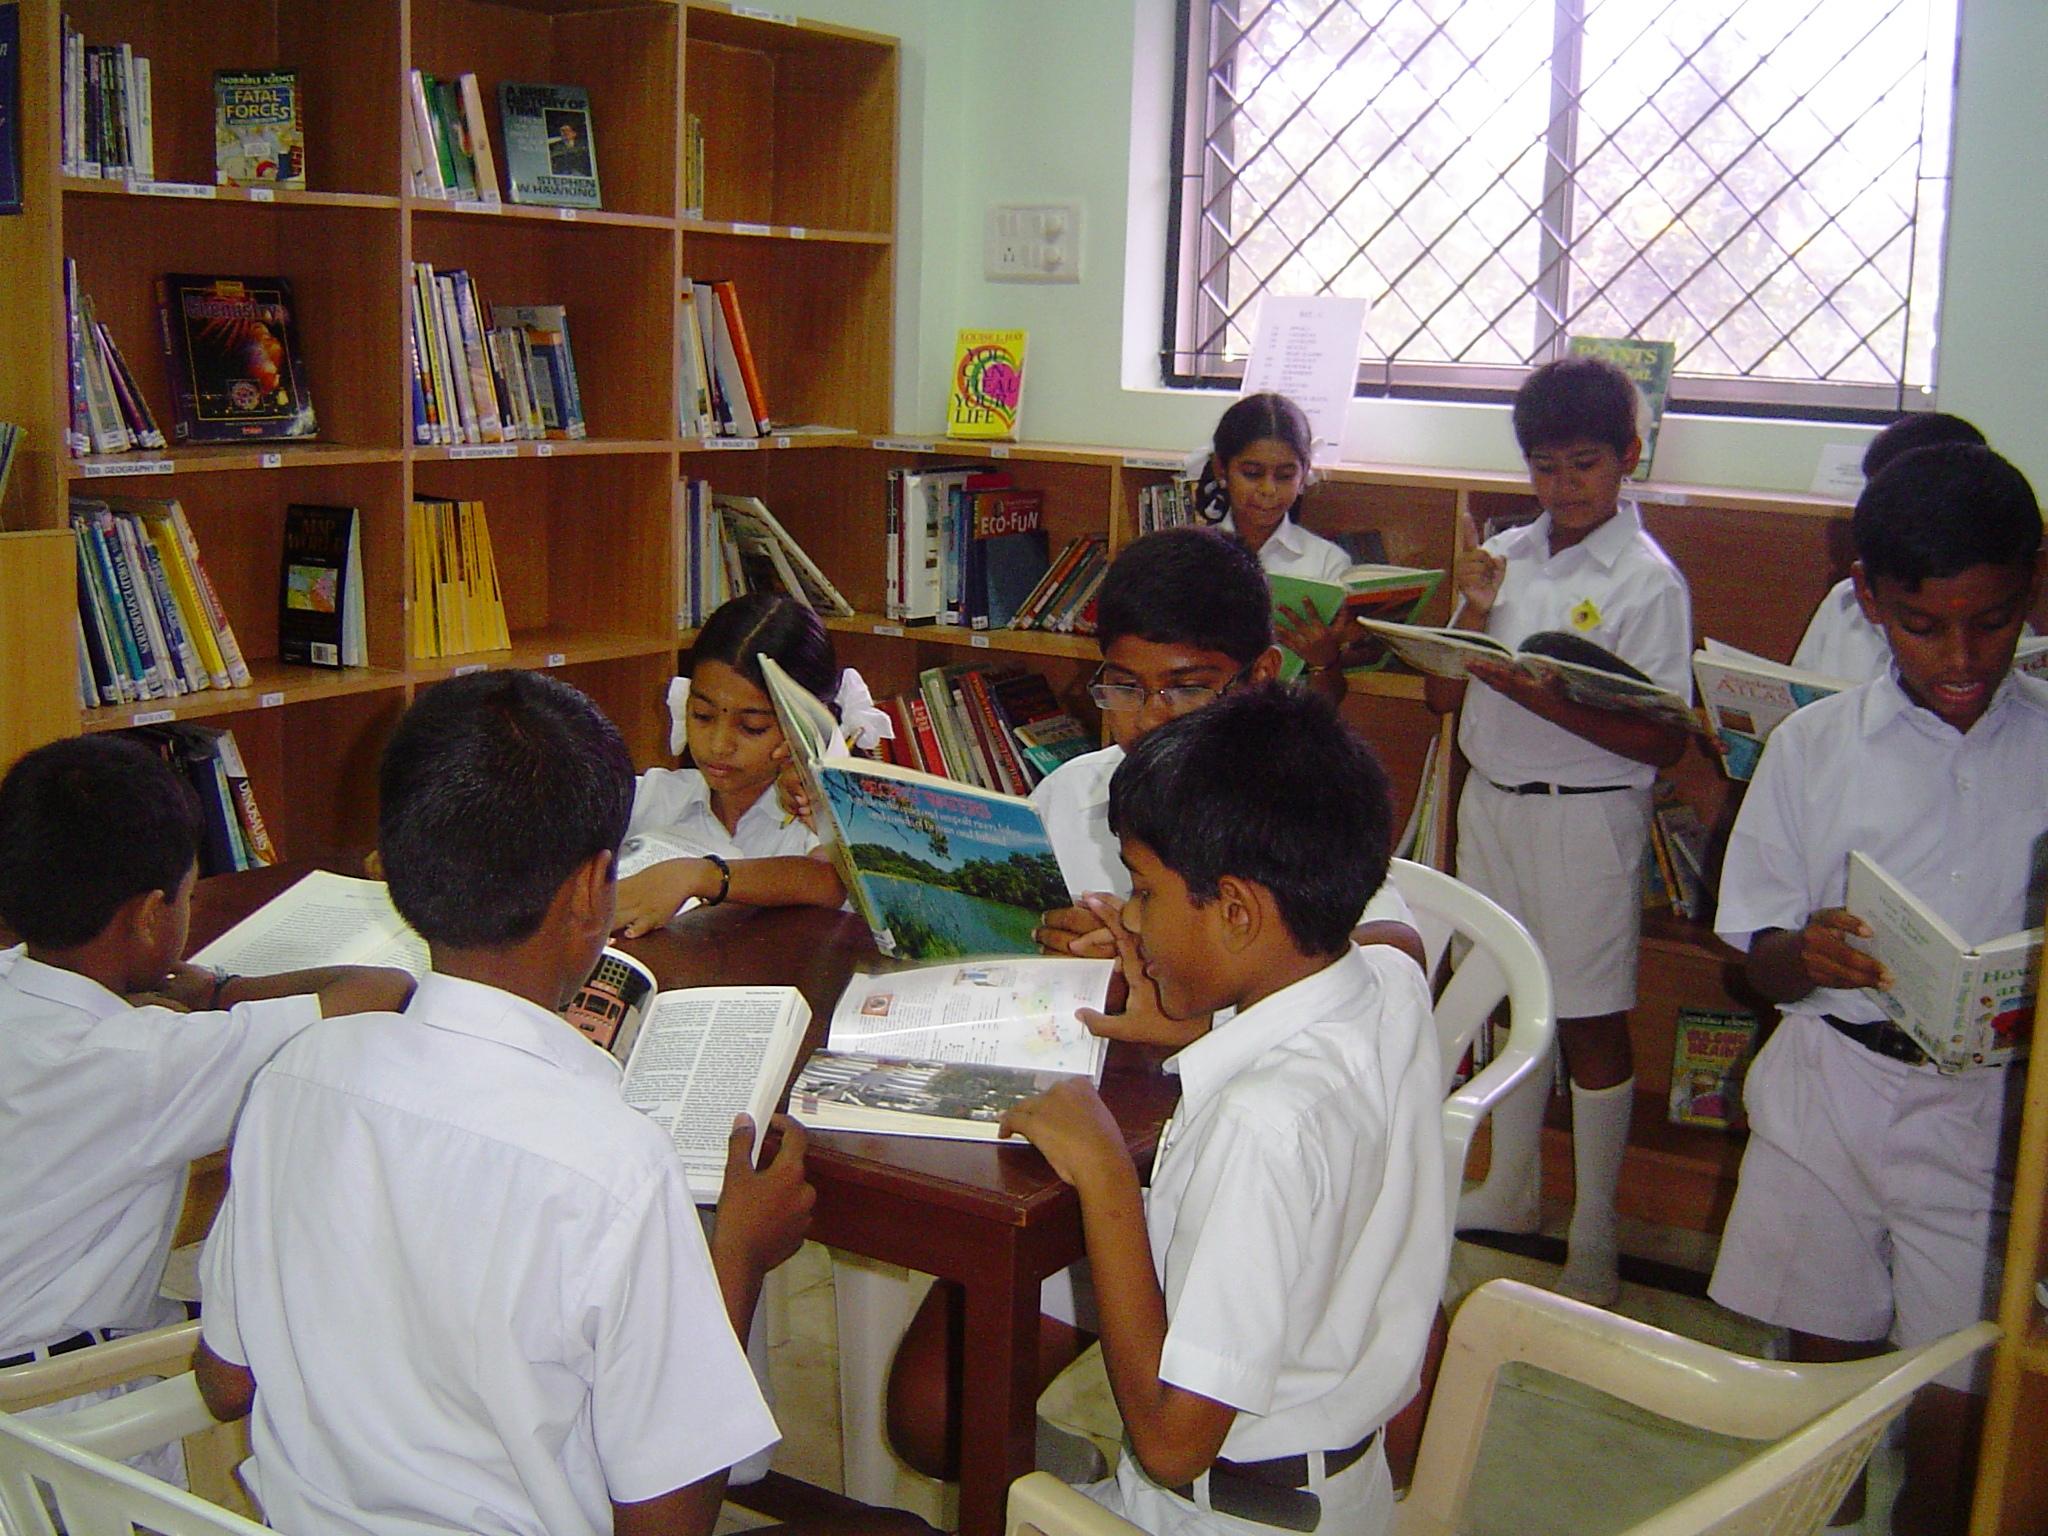 golden jubilee of school Golden jubilee report © 2013 carmel of st joseph school all rights reserved adarsh lane, off marve road, malad west mumbai, maharashtra 400064 india.